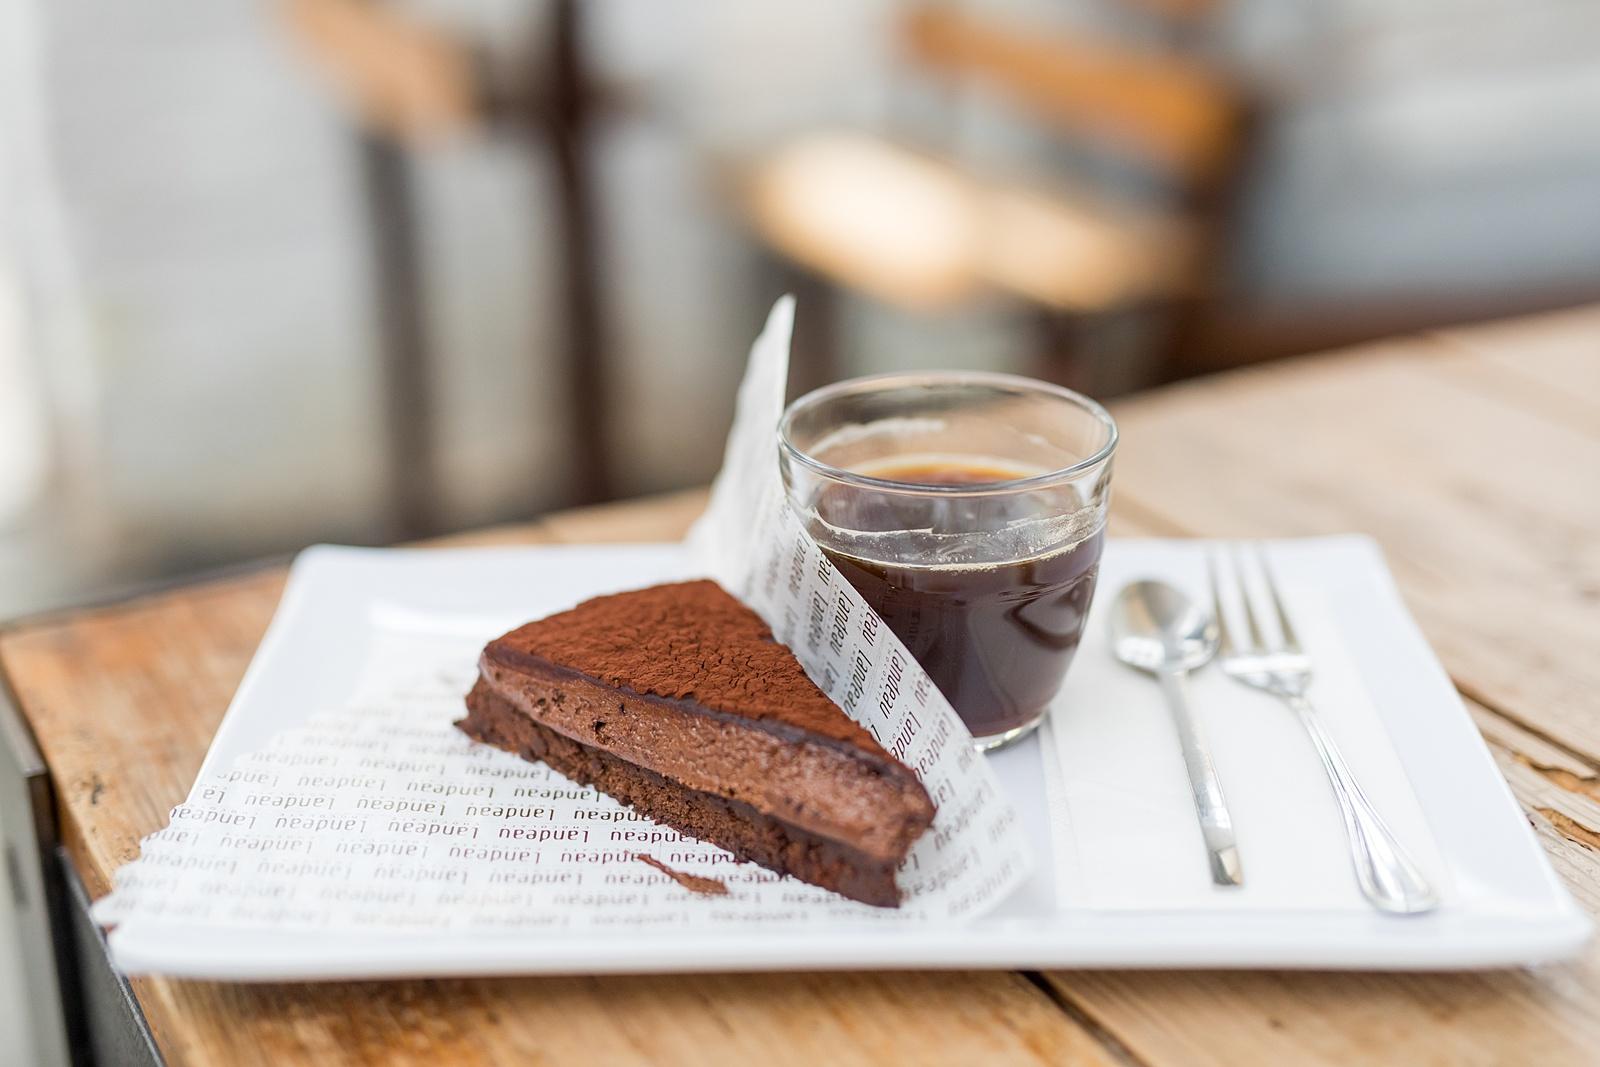 Landeau Chocolate, Lisbon